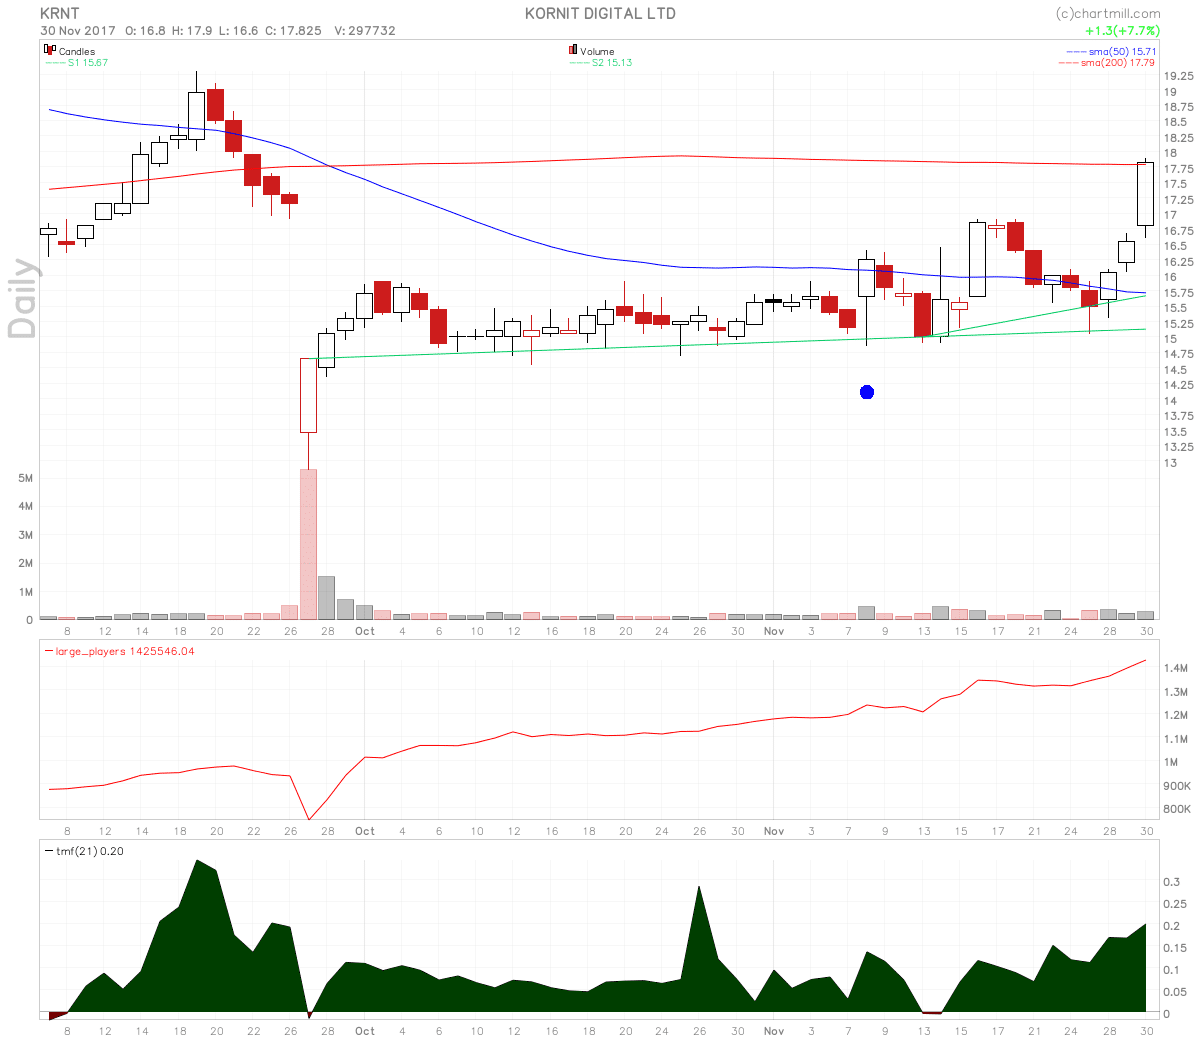 Kornit Digital stock